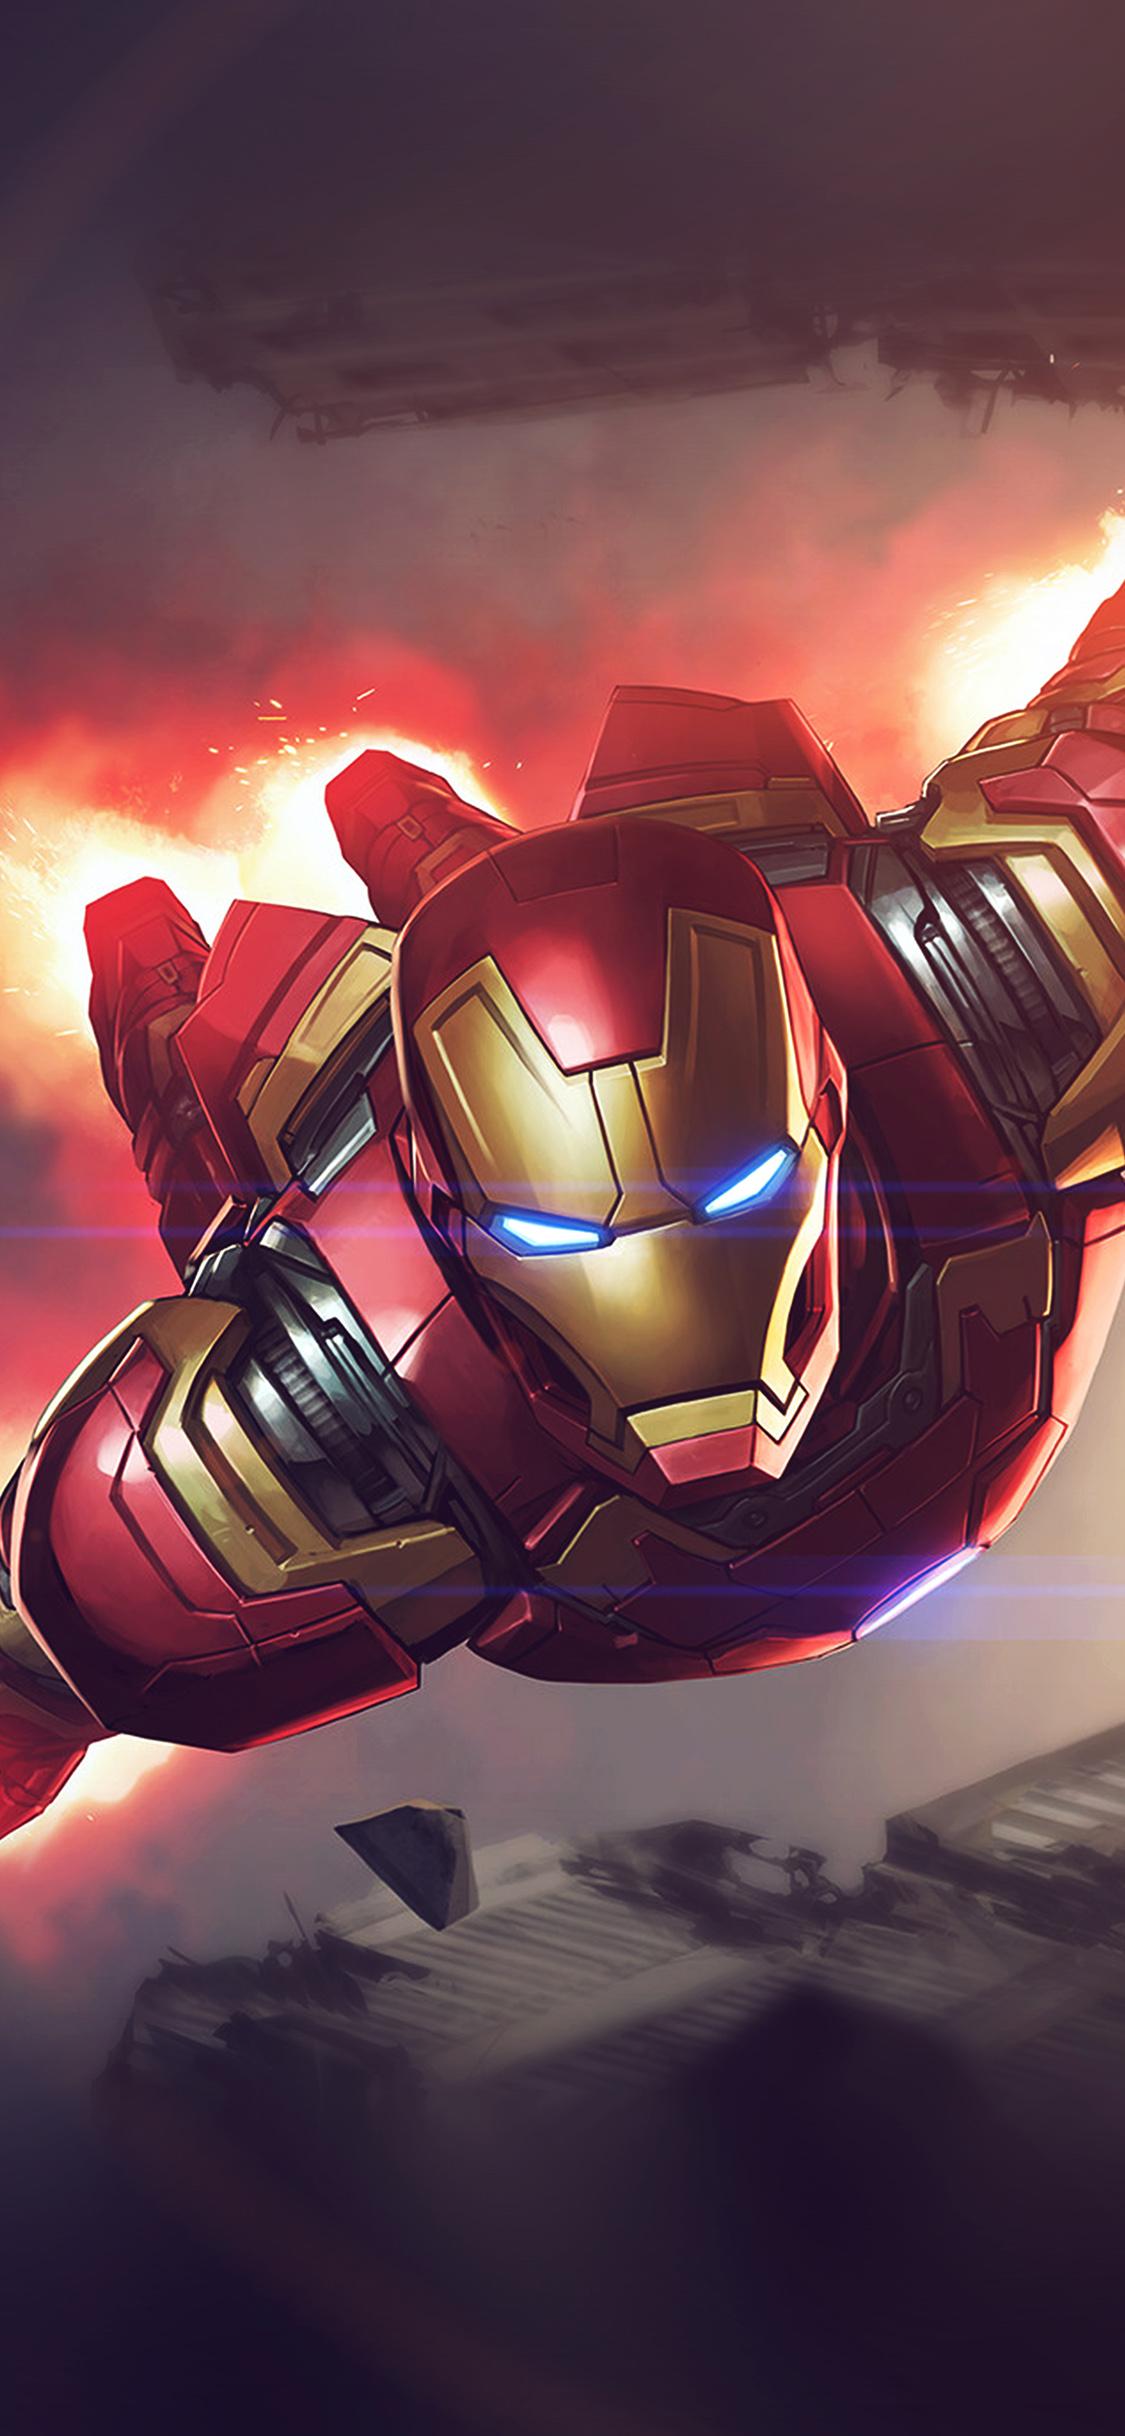 iPhonexpapers.com-Apple-iPhone-wallpaper-az71-ironman-hero-marvel-illustration-art-blue-flare